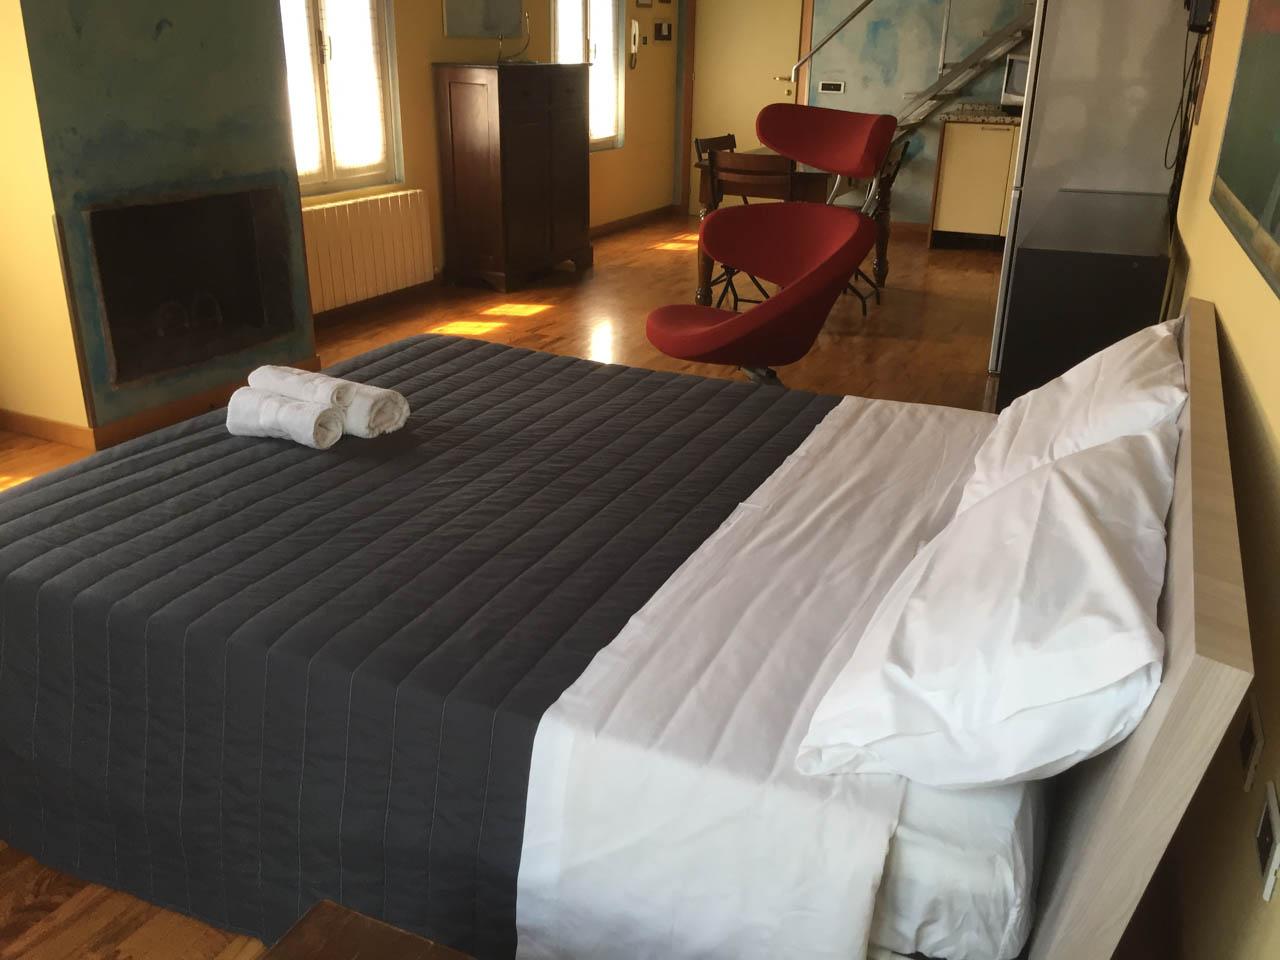 bed-and-breakfast-treviglio-camera-cielo-0004